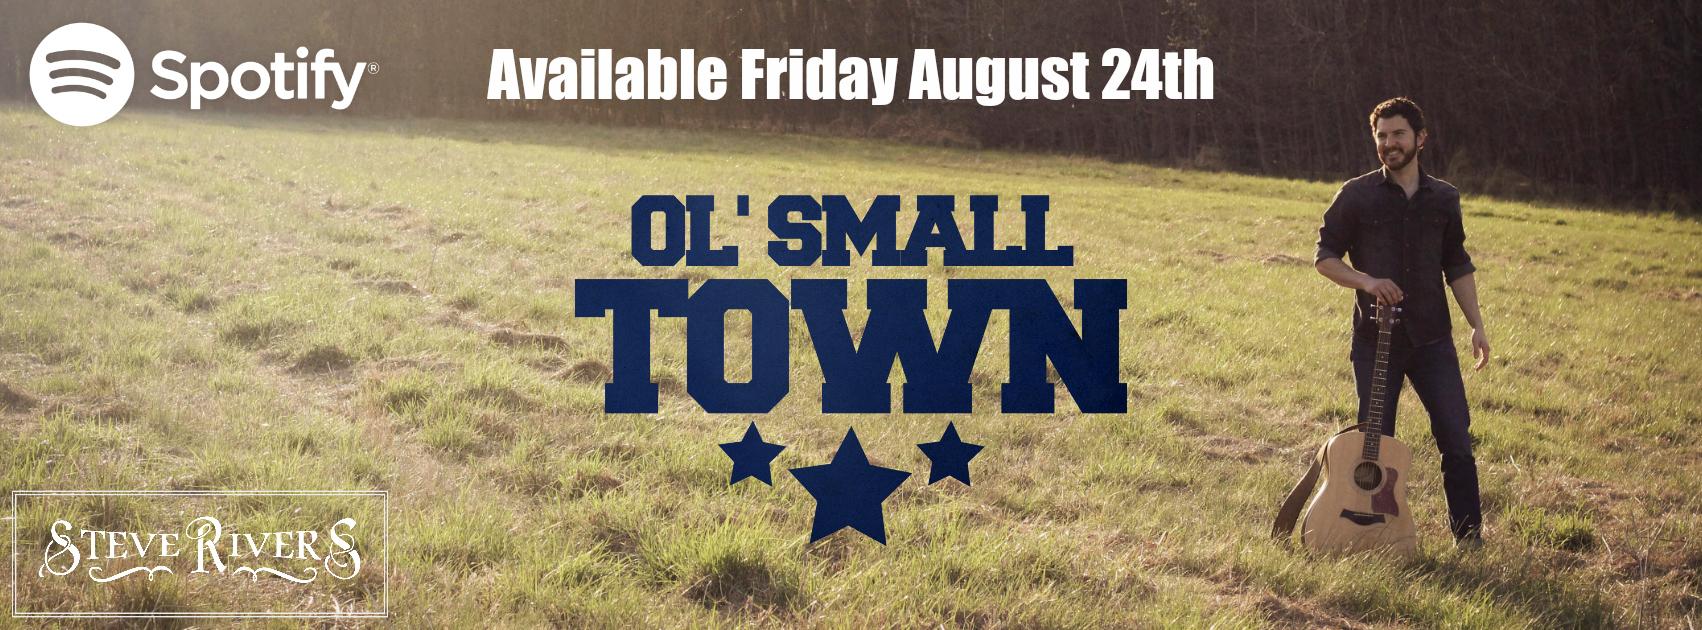 OL SMALL TOWN FB BANNER.jpg